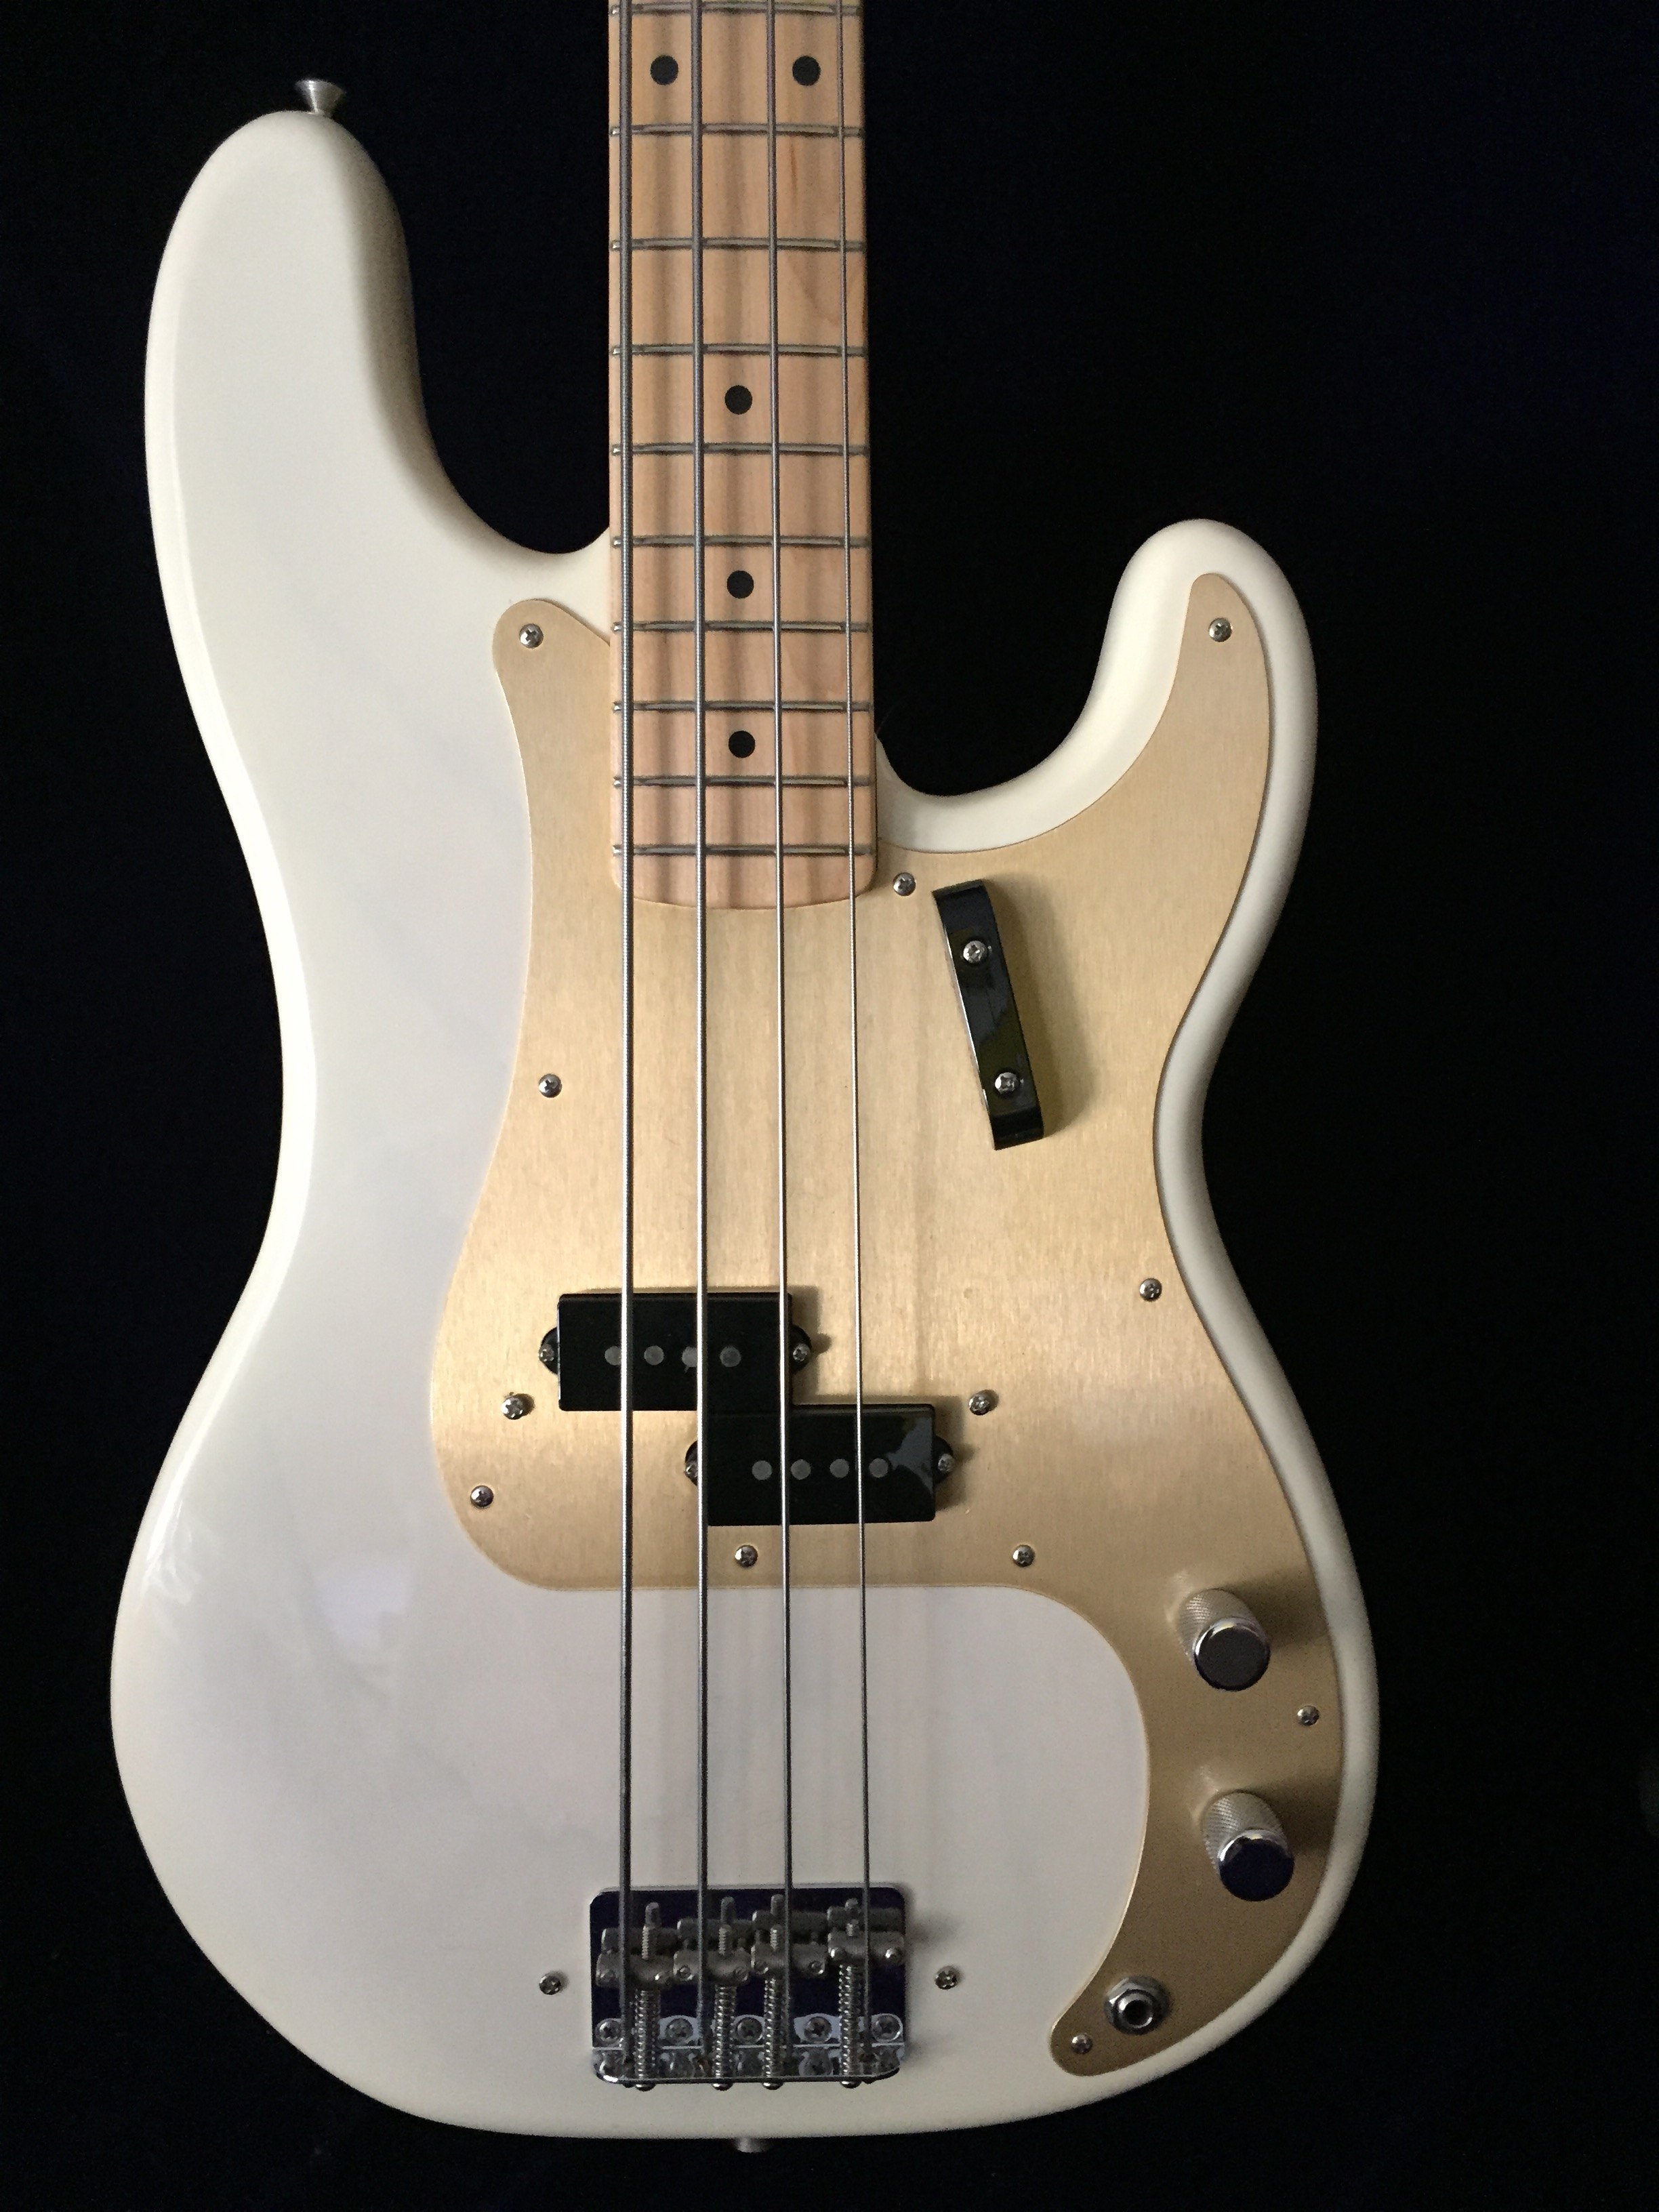 plectrum nyc 58 fender american vintage precision bass. Black Bedroom Furniture Sets. Home Design Ideas